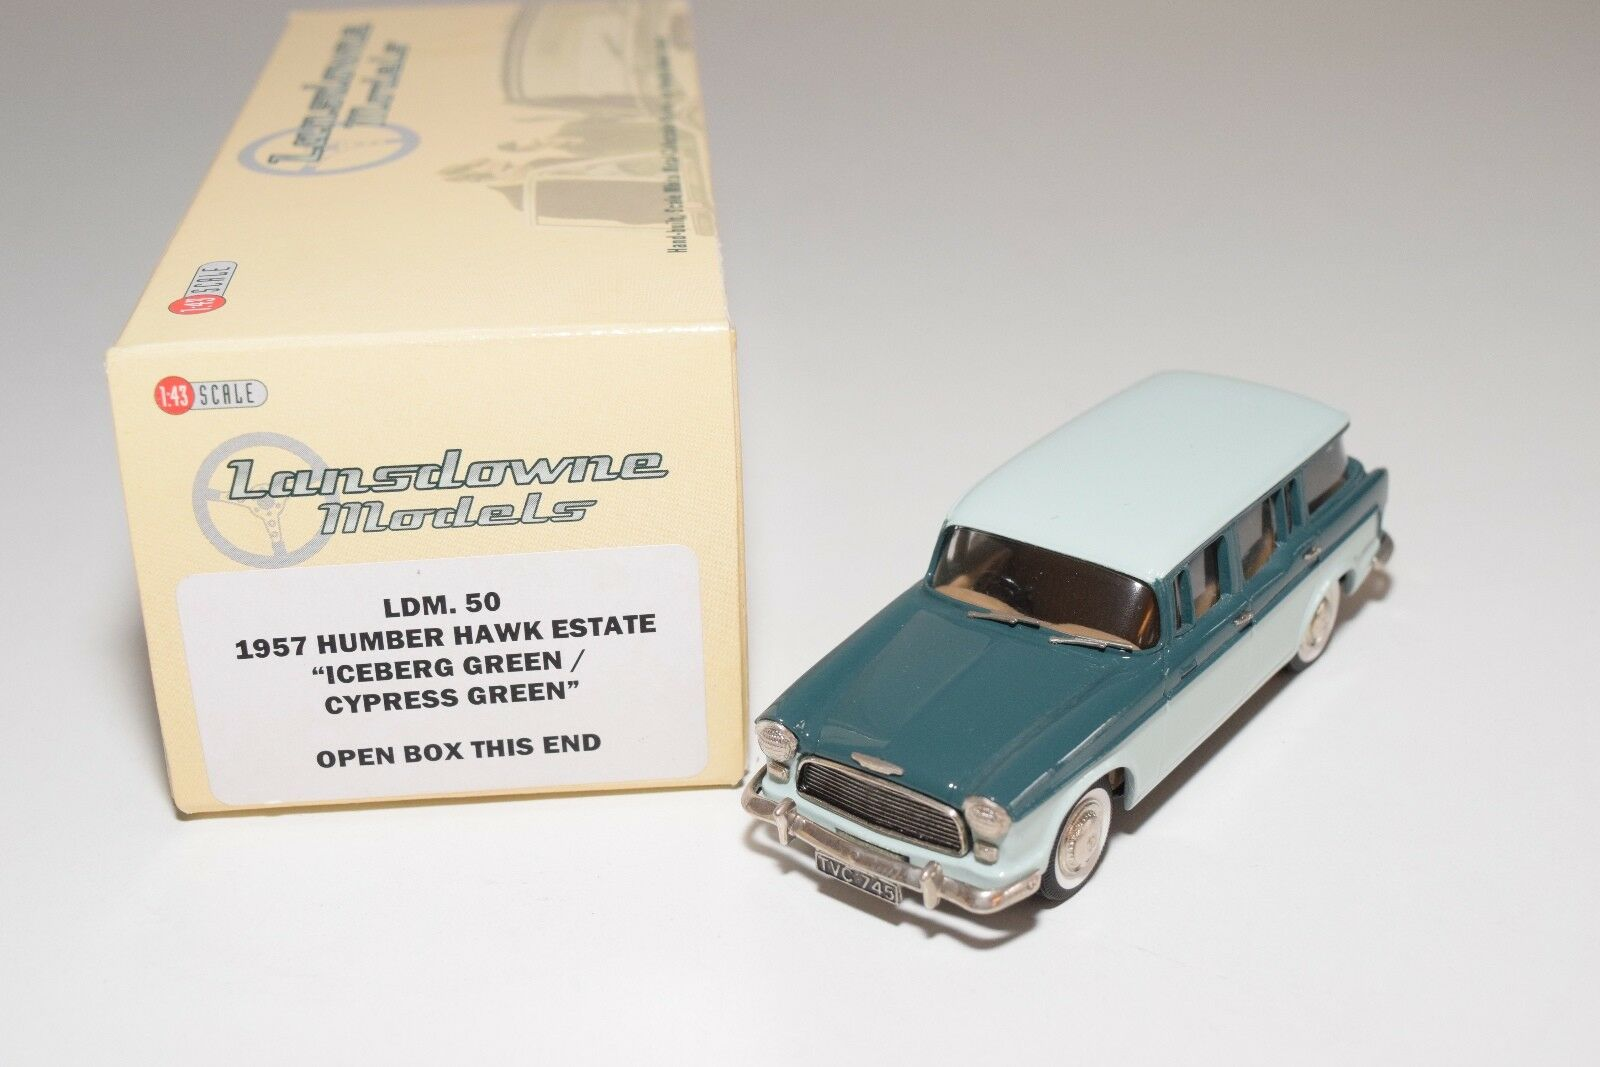 LANDSOWNE modelllllerLER LDM 50 1957 HUMBER HAWK ESTADE TVÅ TONE grön MINT lådaED